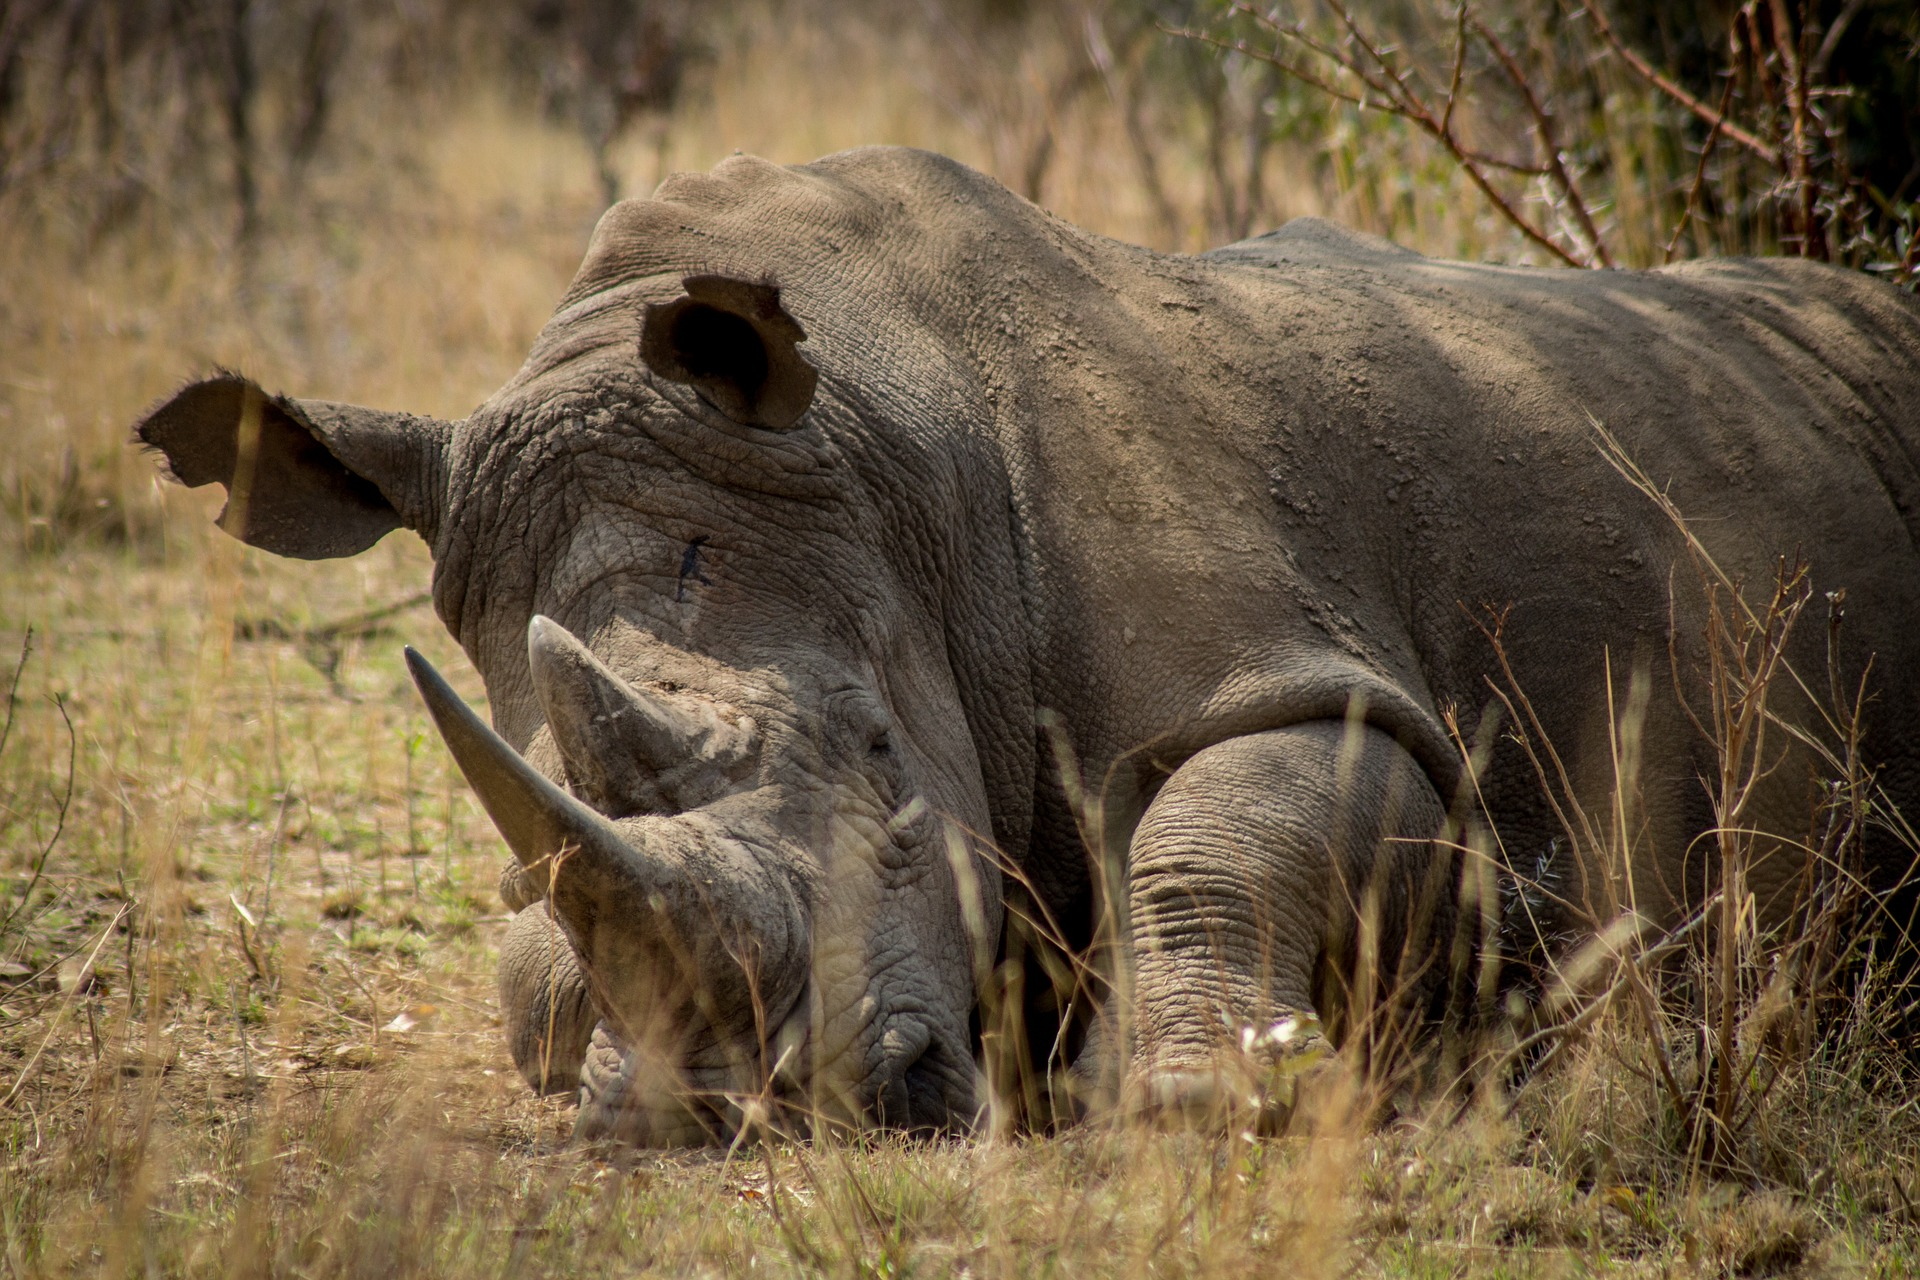 rhinos killed by poachers in South Africa falls below 1,000 f